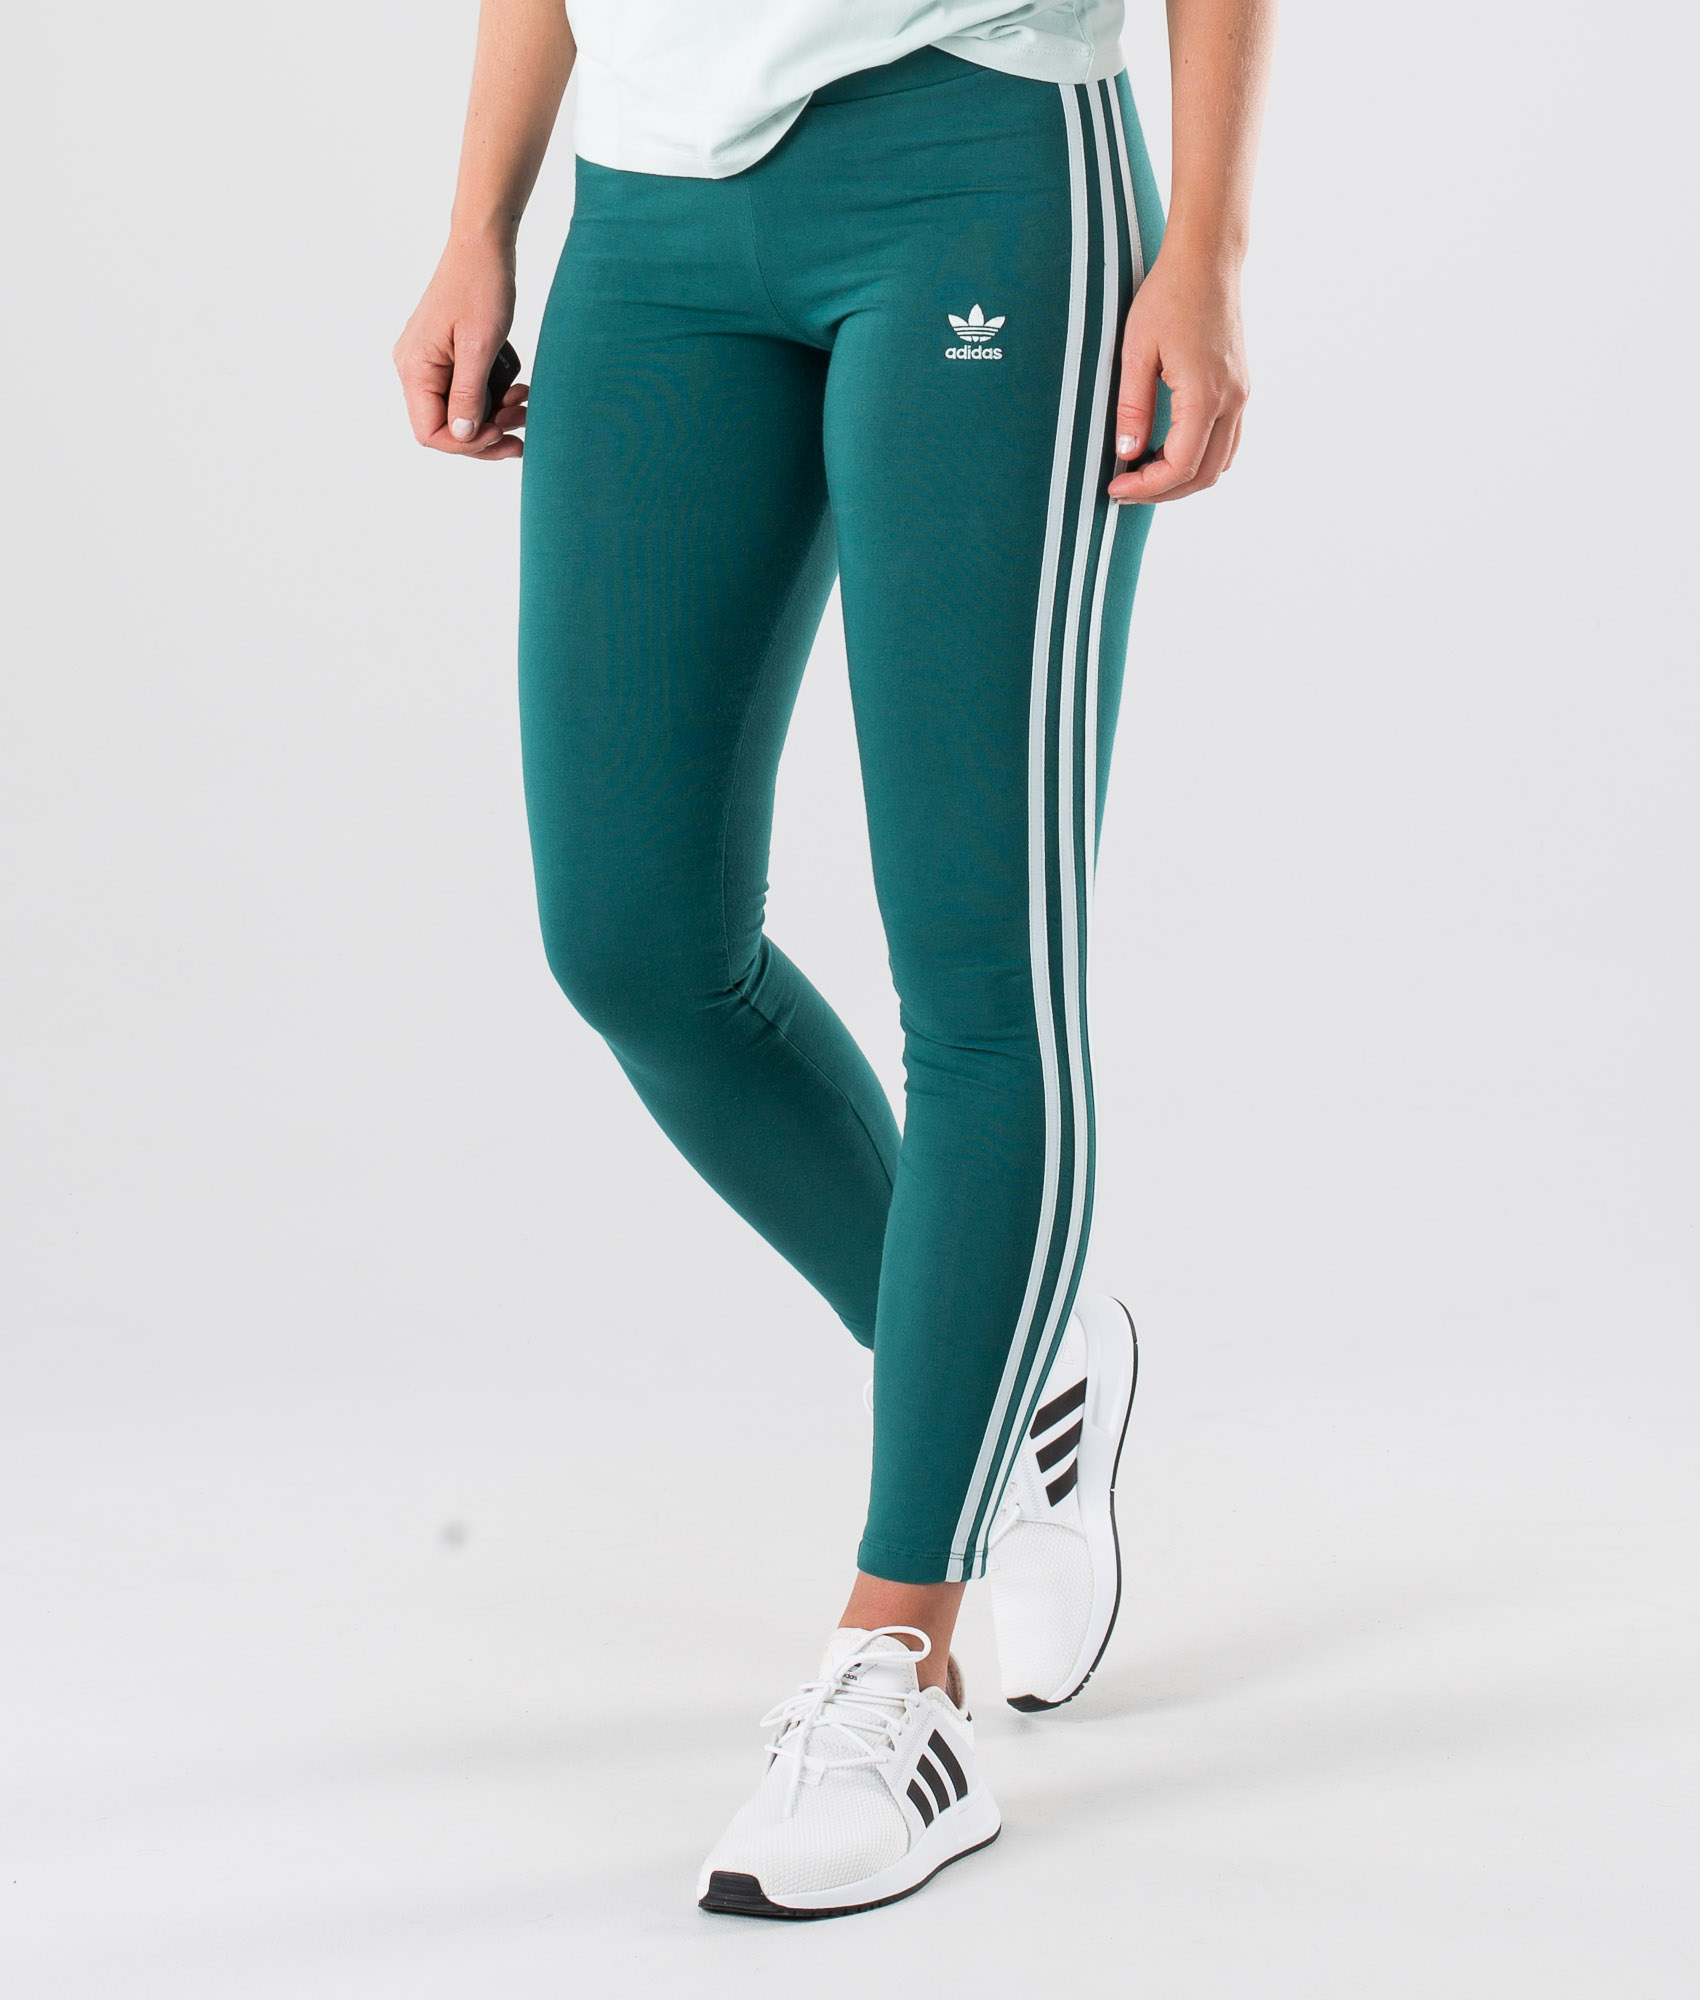 Adidas Originals 3 Stripes Tight Leggings Noble Green